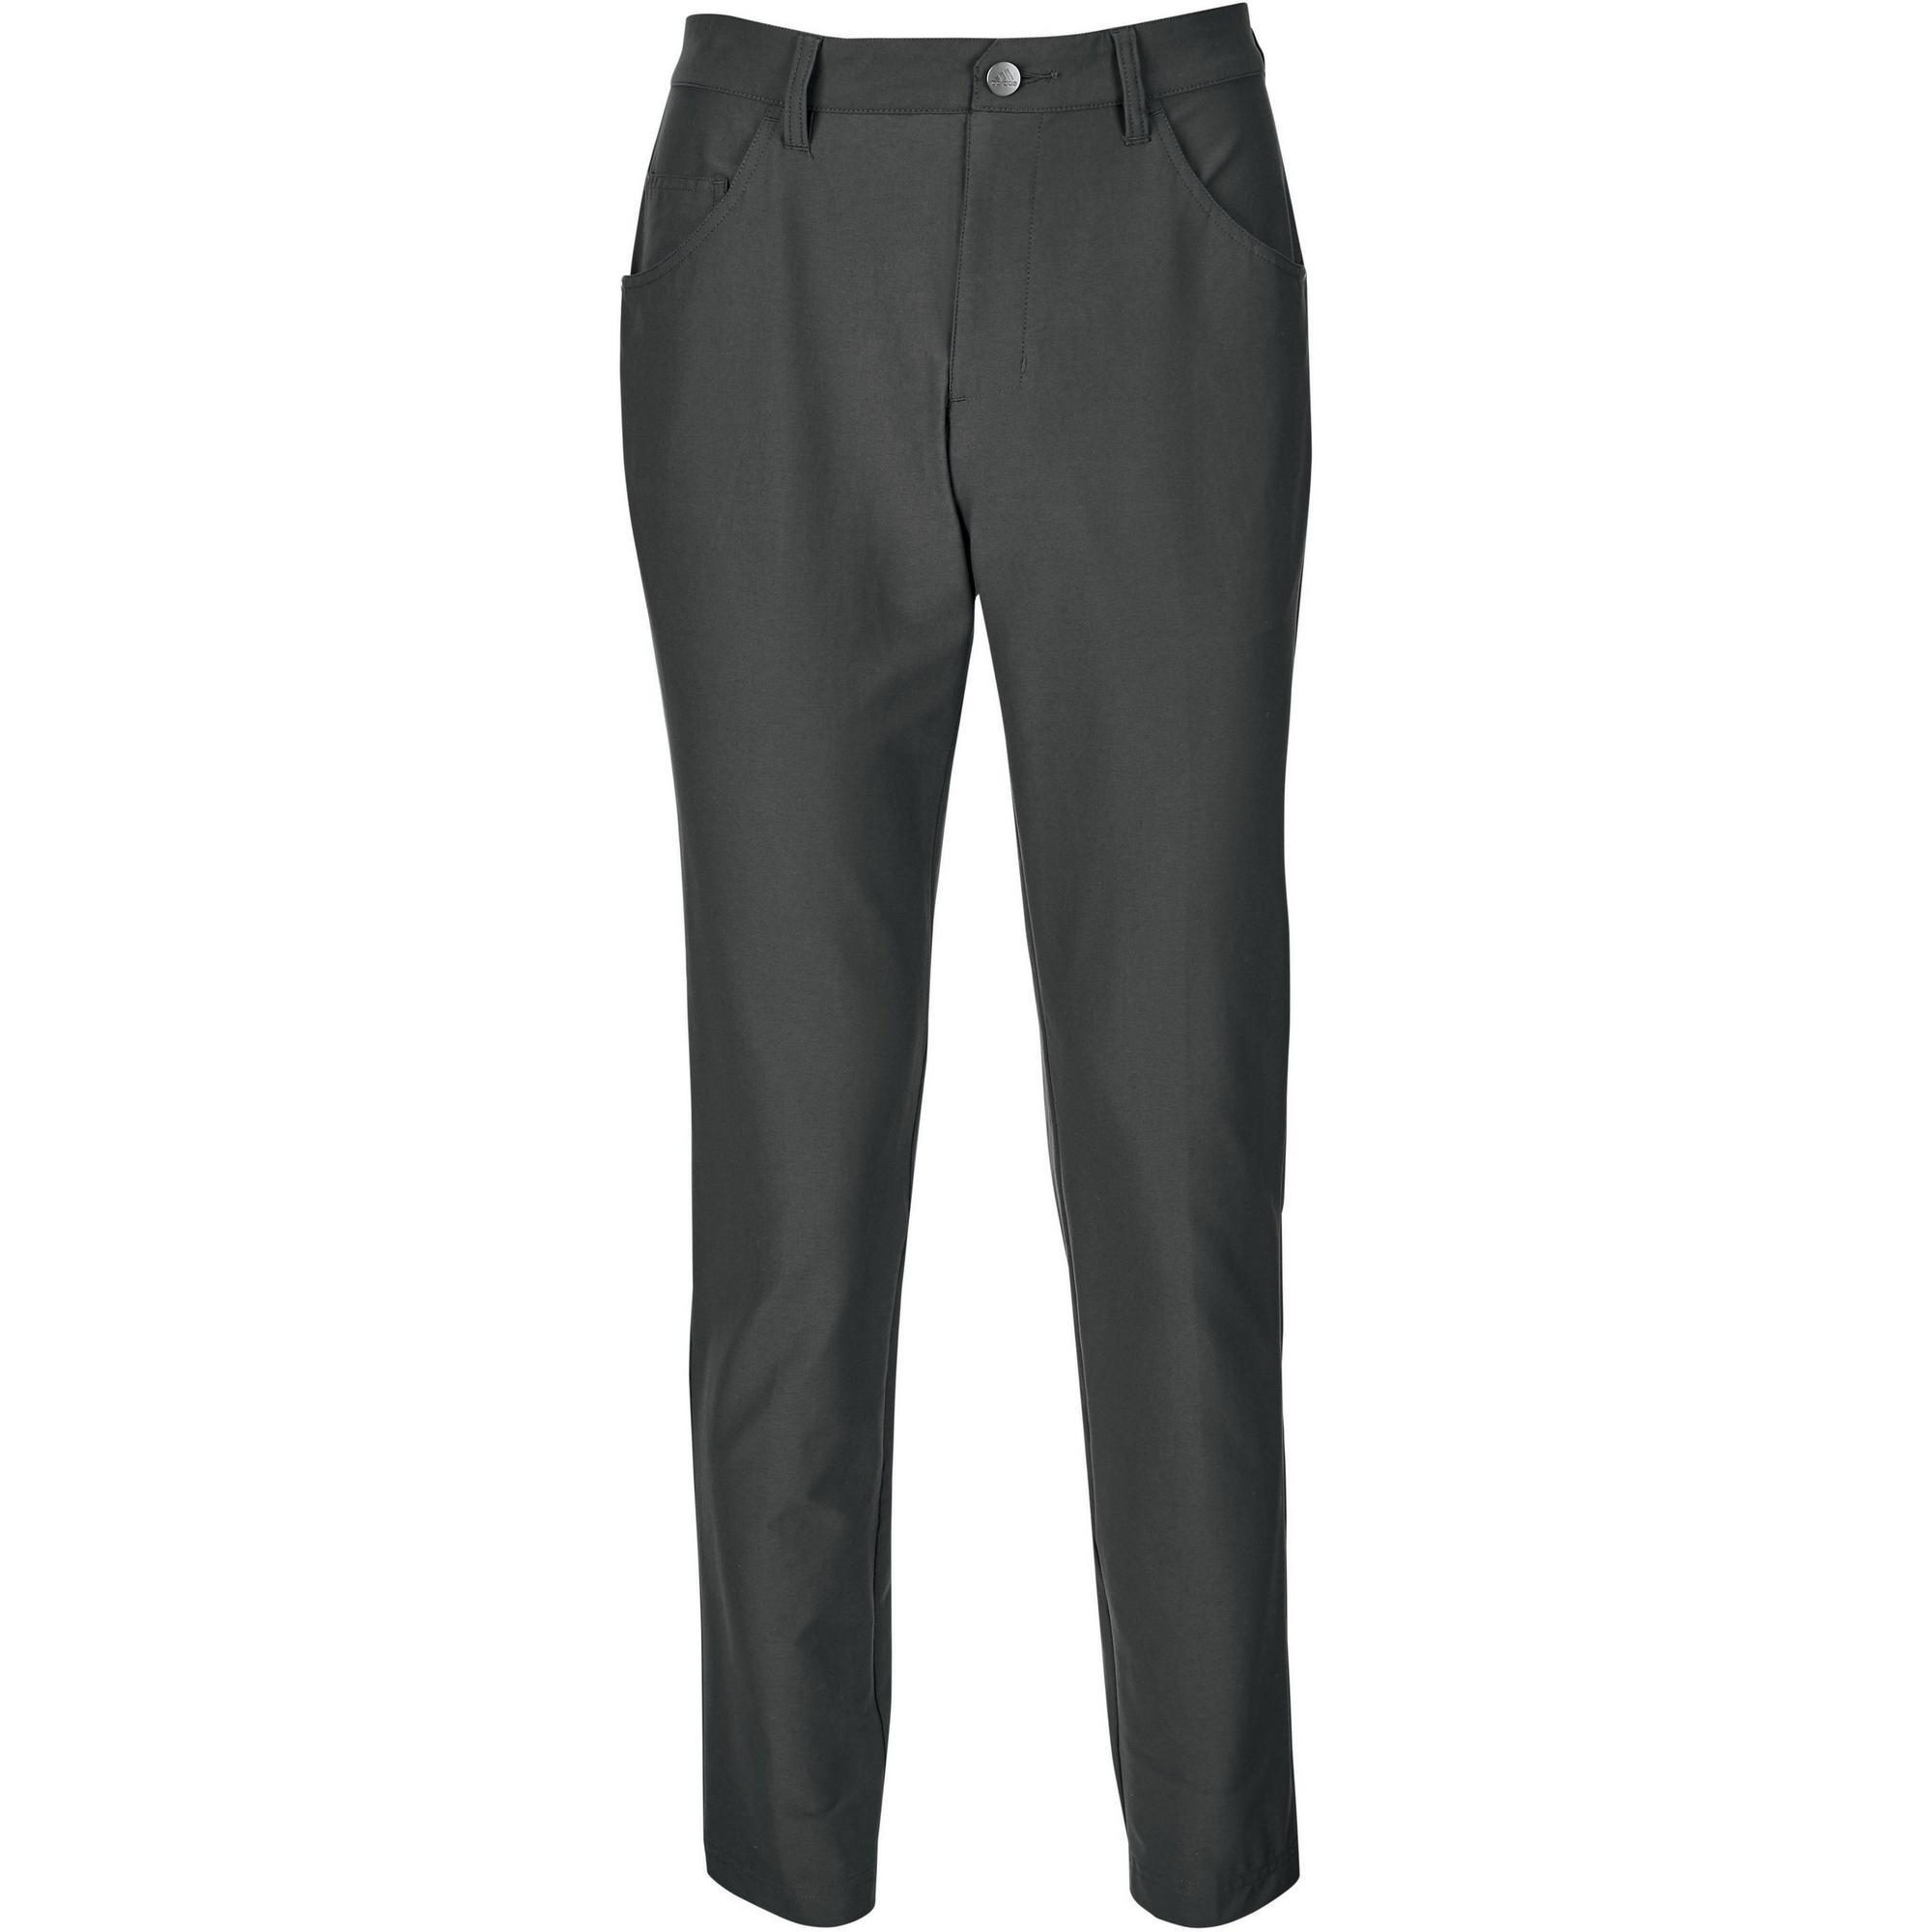 Men's adicross Beyond 18 Slim 5 Pocket Pants